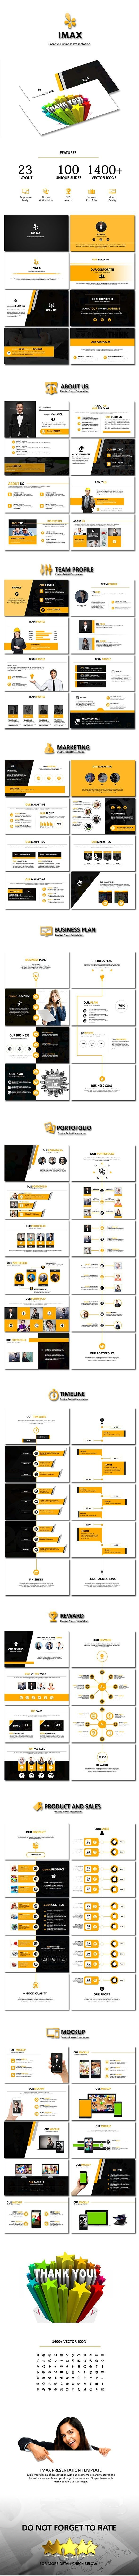 IMAX - Google Slides Business Presentation - Google Slides Presentation Templates